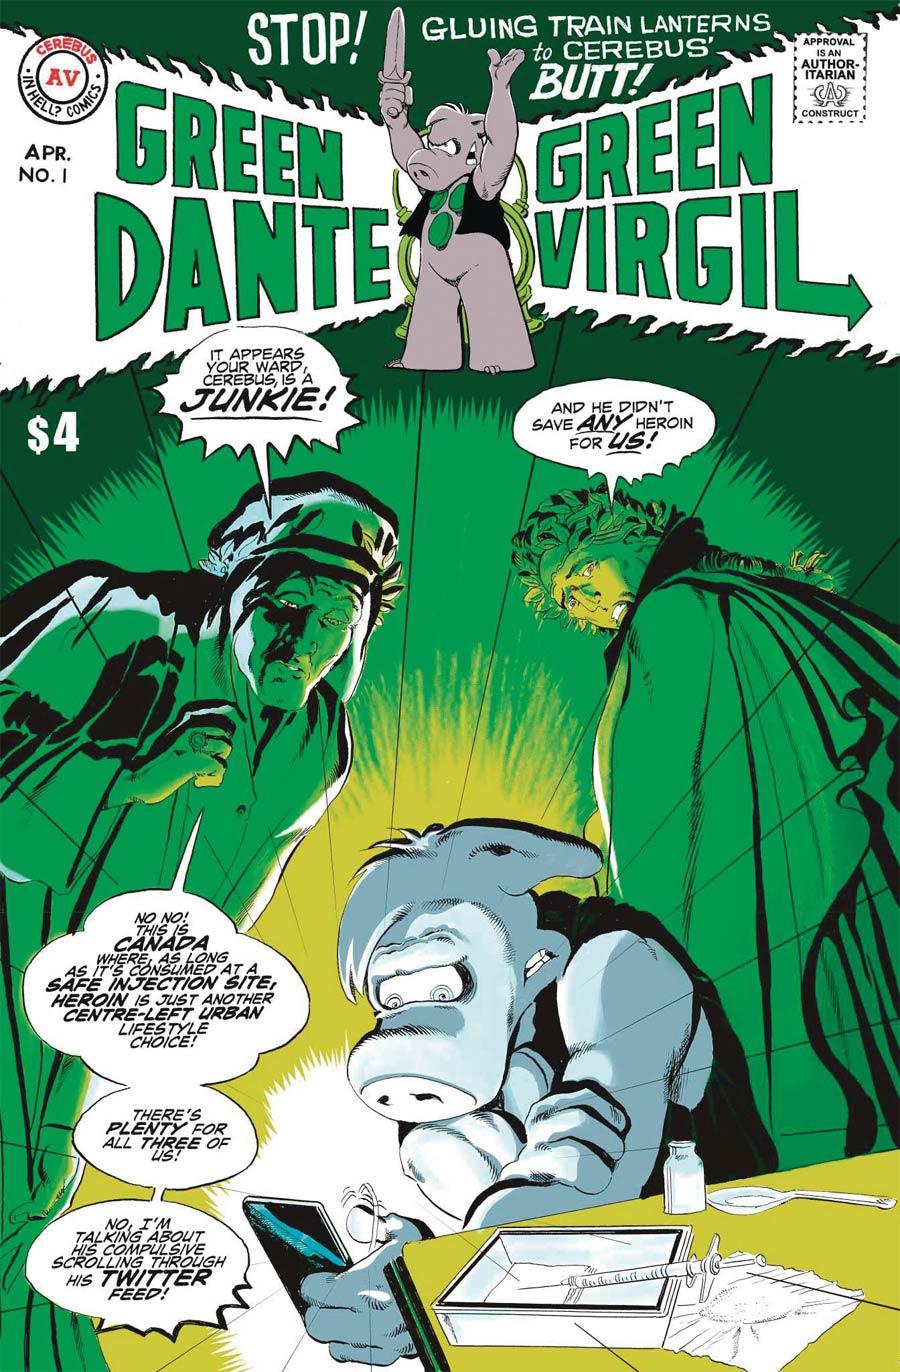 Green Dante Green Virgil One Shot